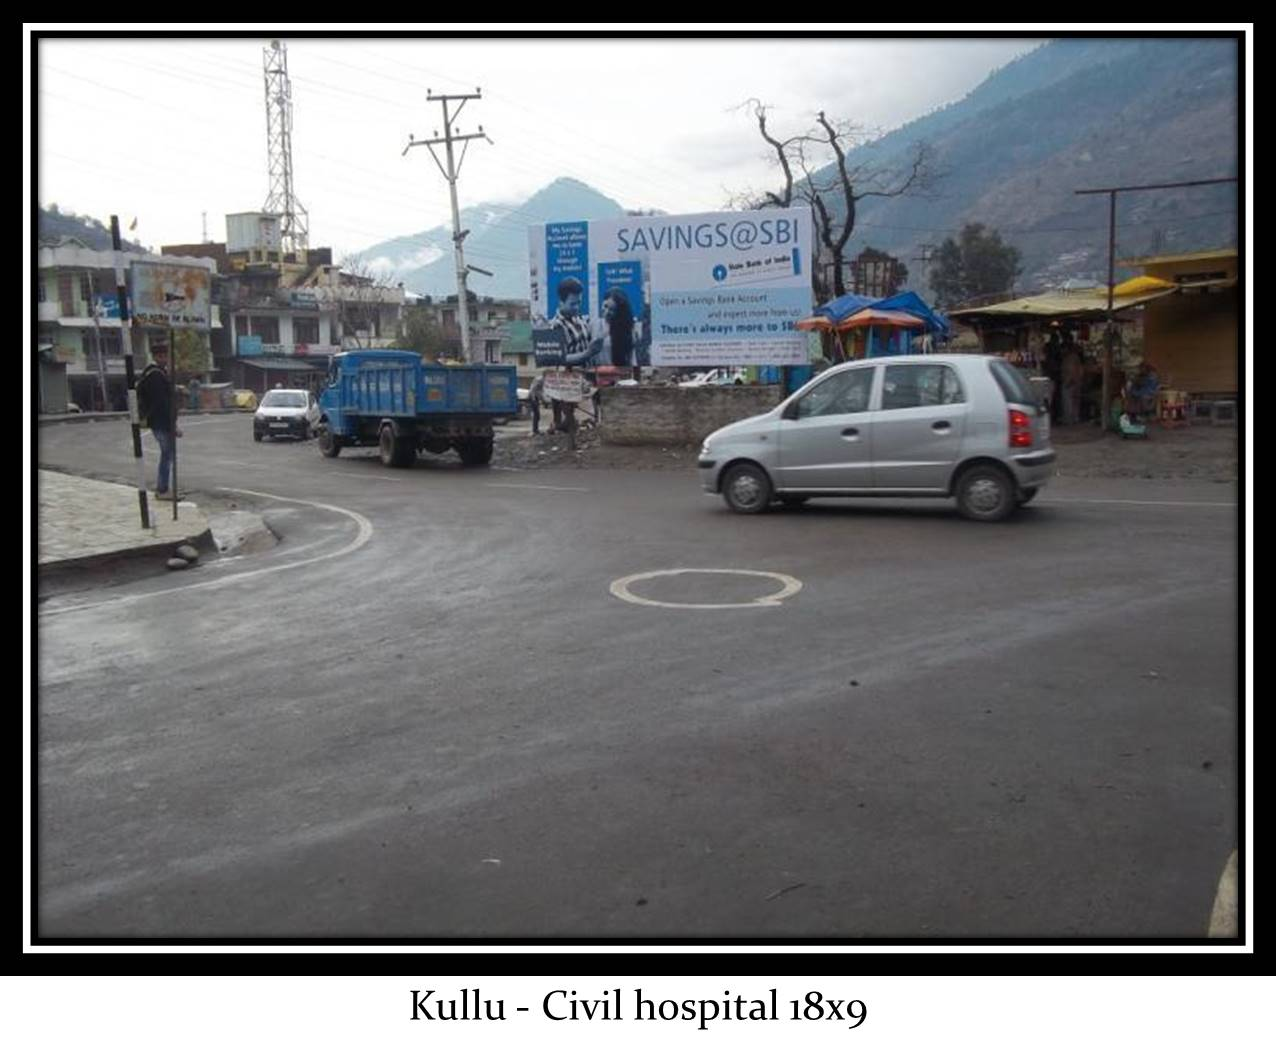 Civil hospital, Kullu